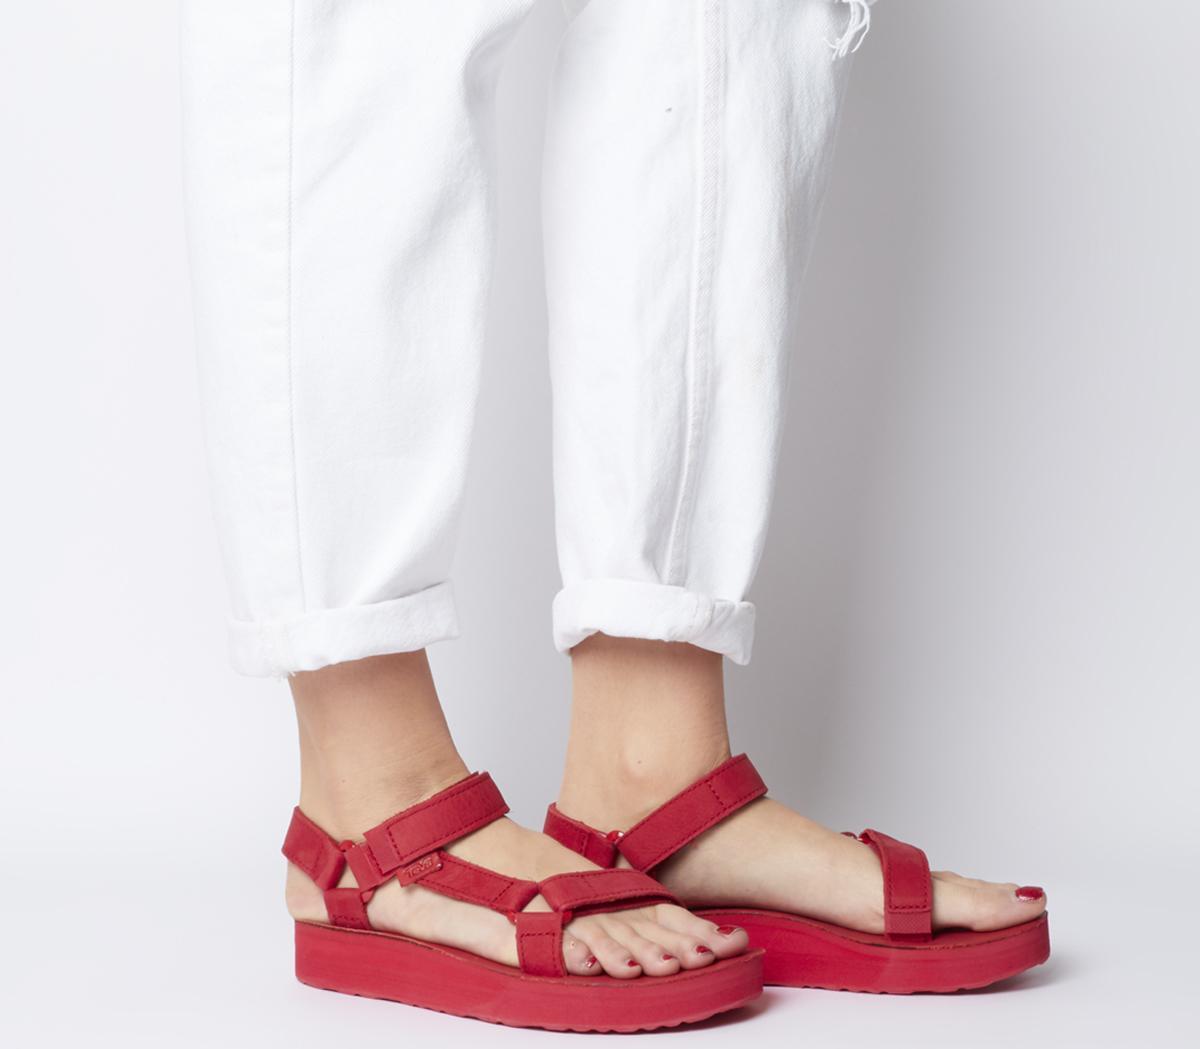 Midform Universal Leather Sandals